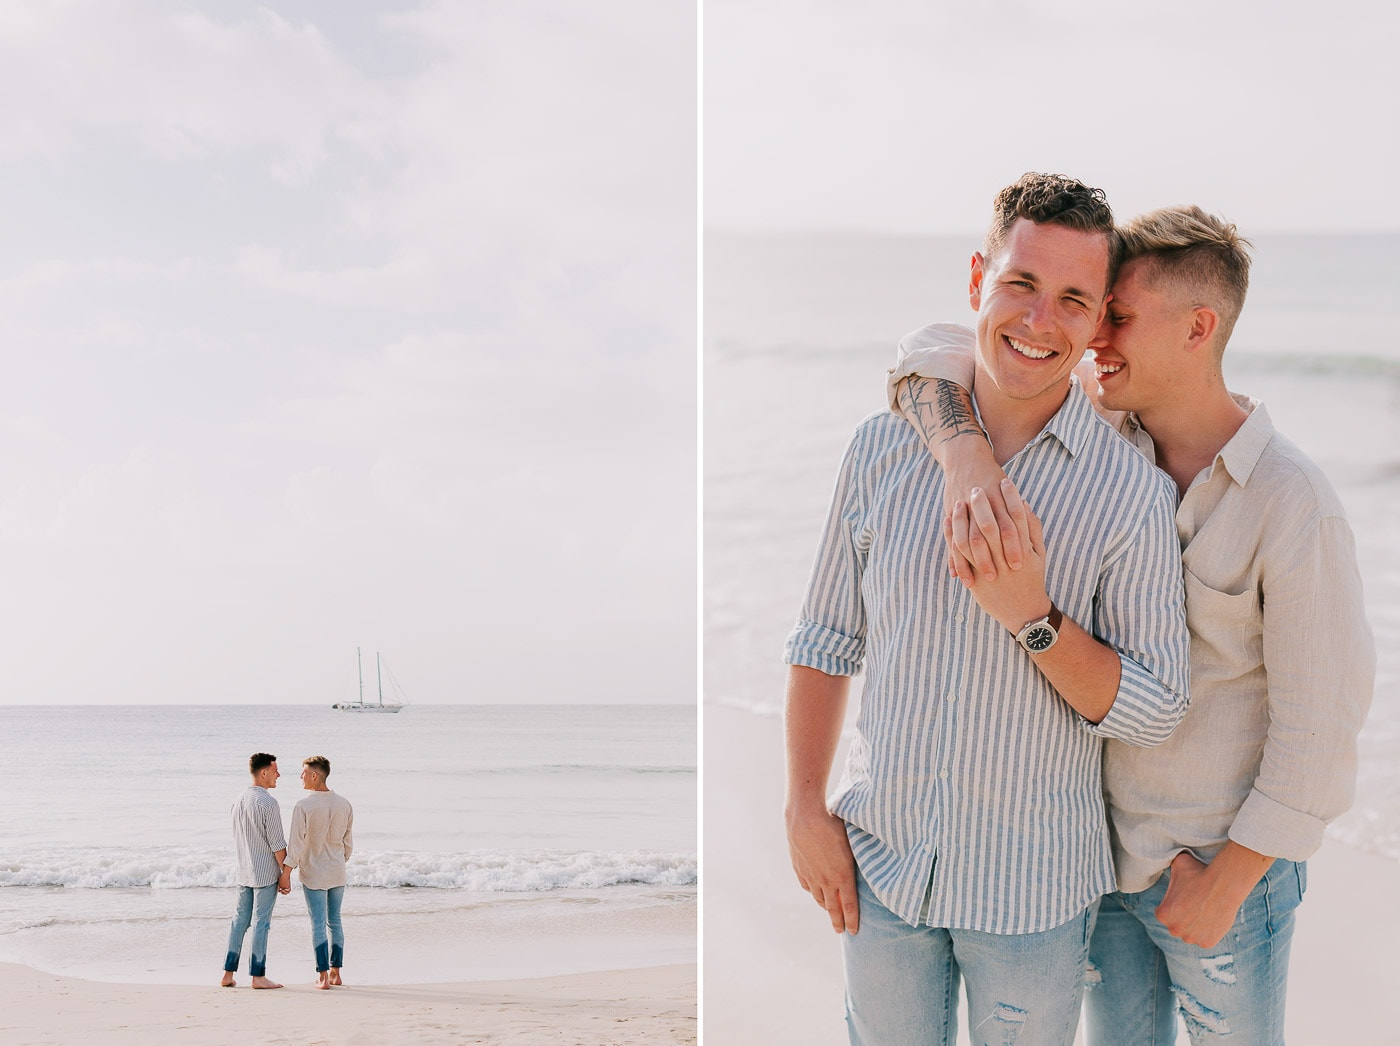 photoshoot in macao beach